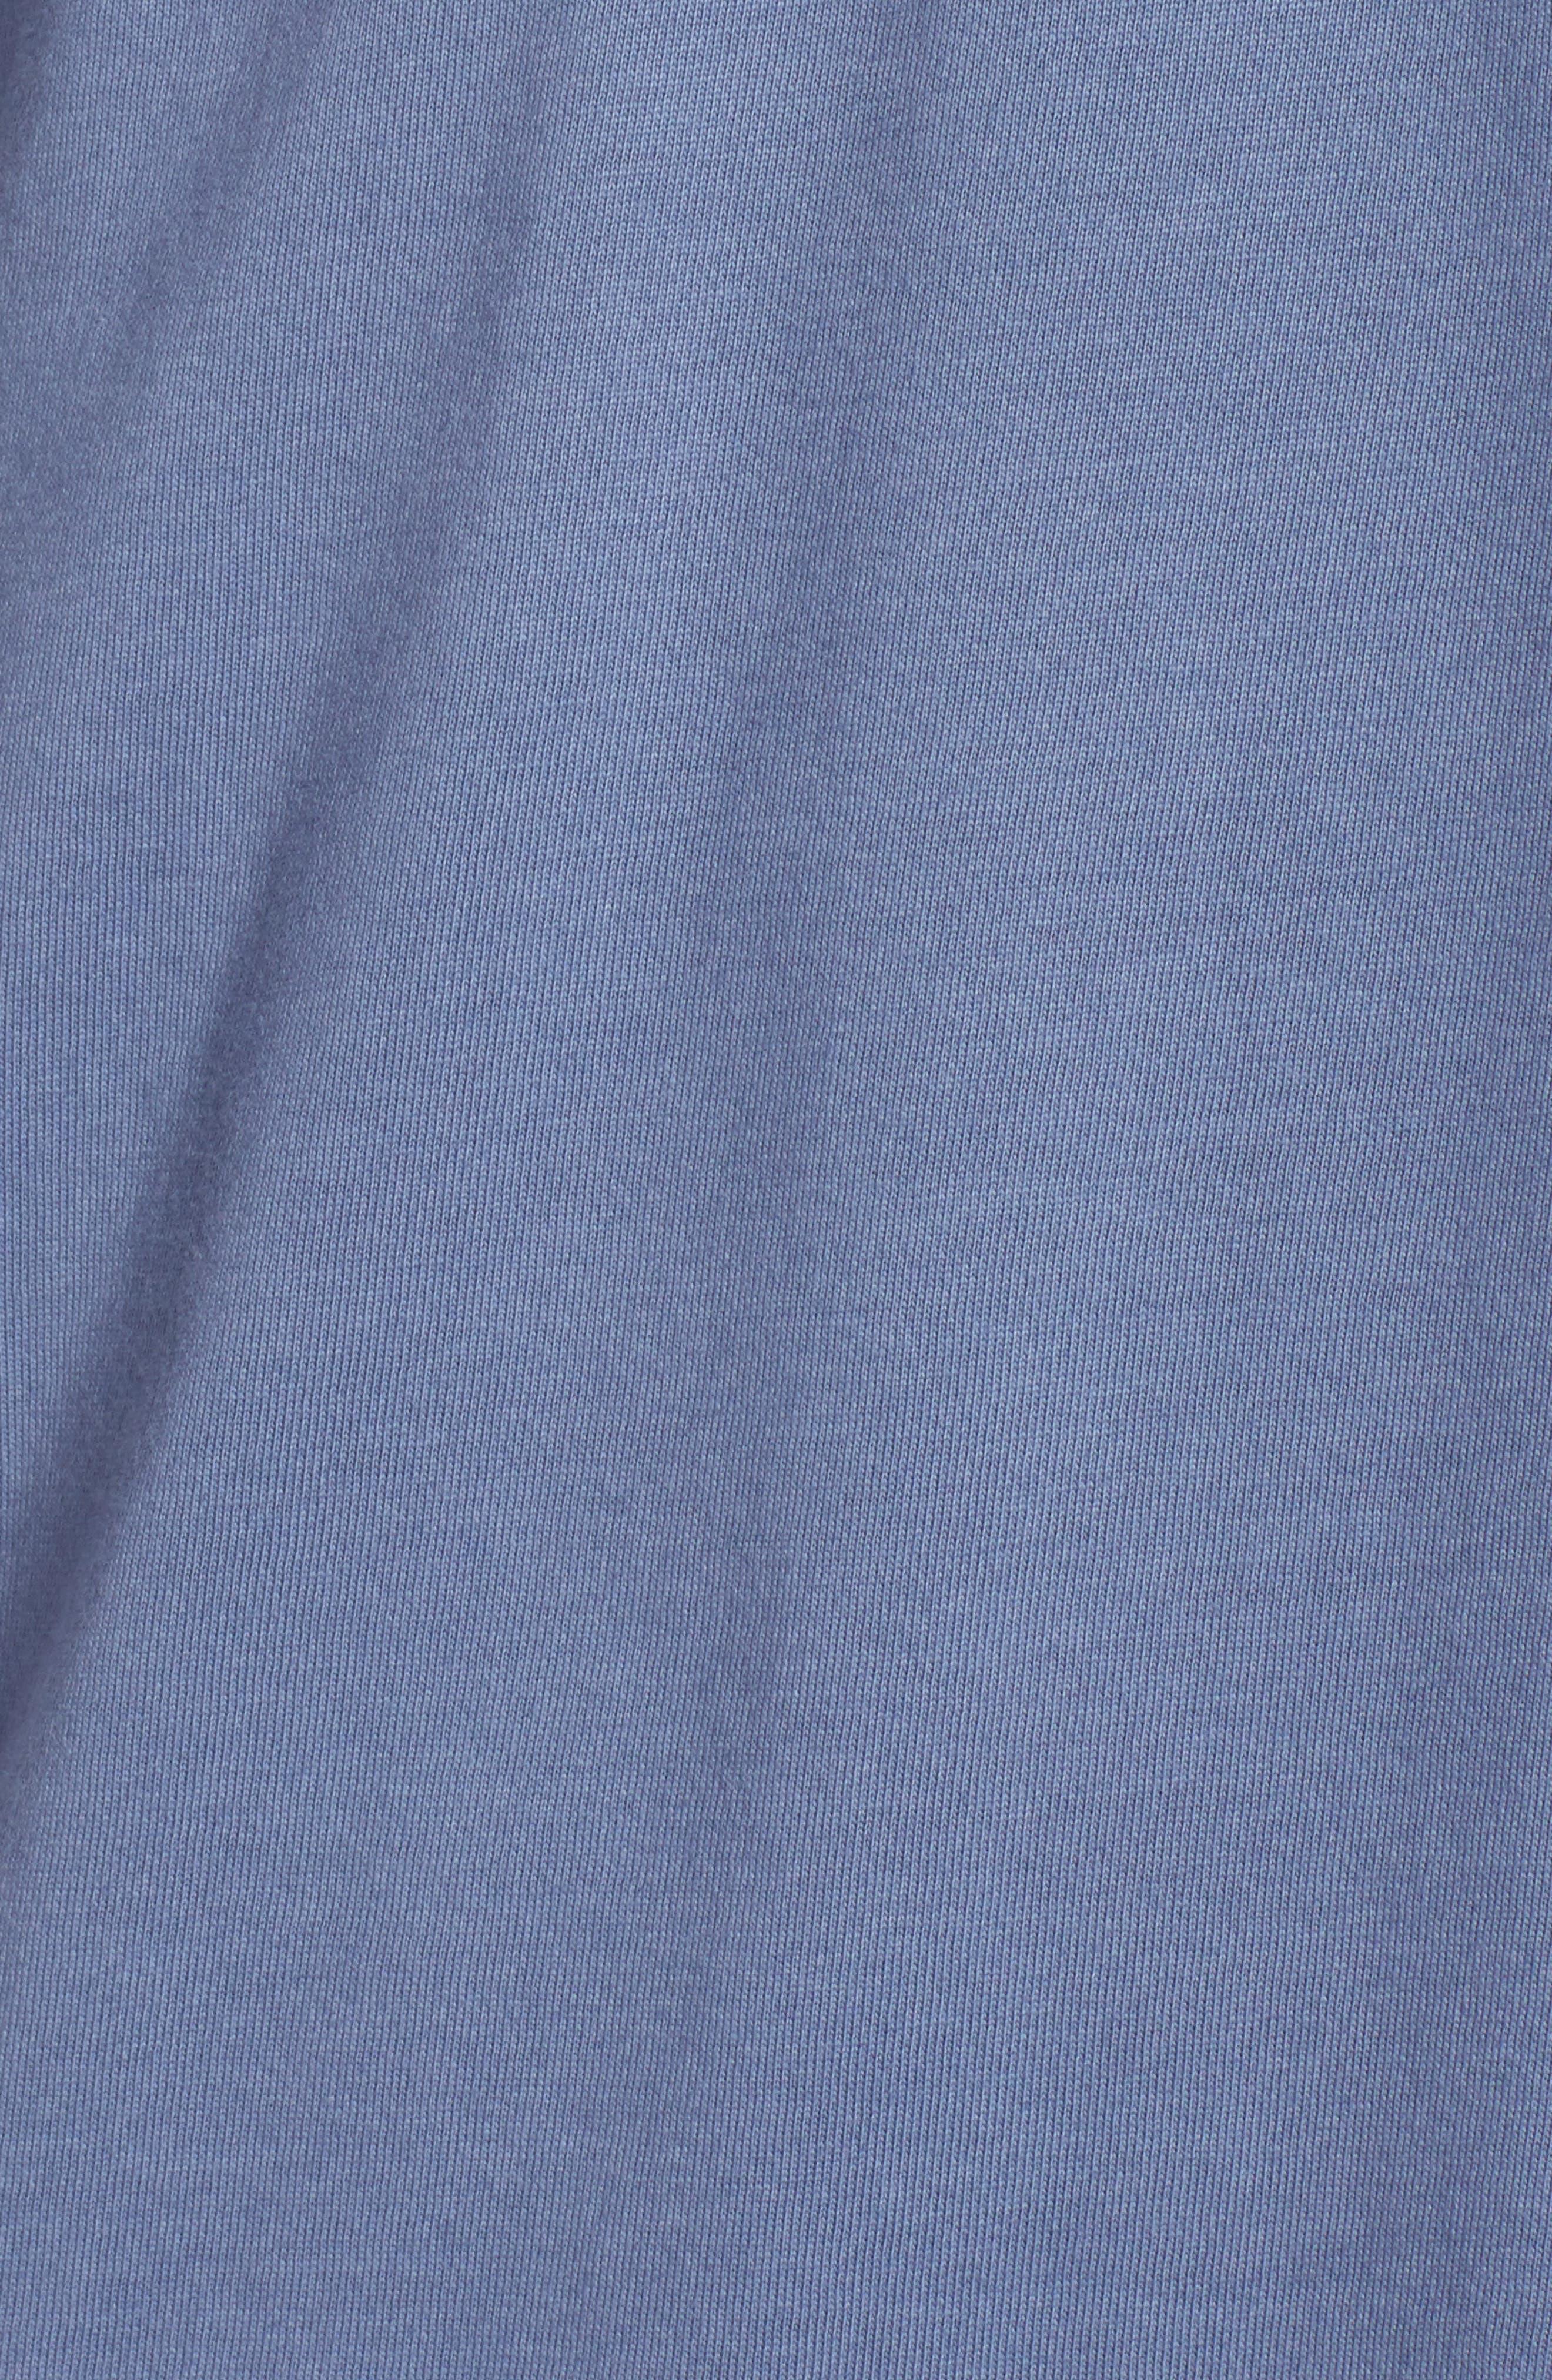 Last Resort Pocket T-Shirt,                             Alternate thumbnail 5, color,                             463